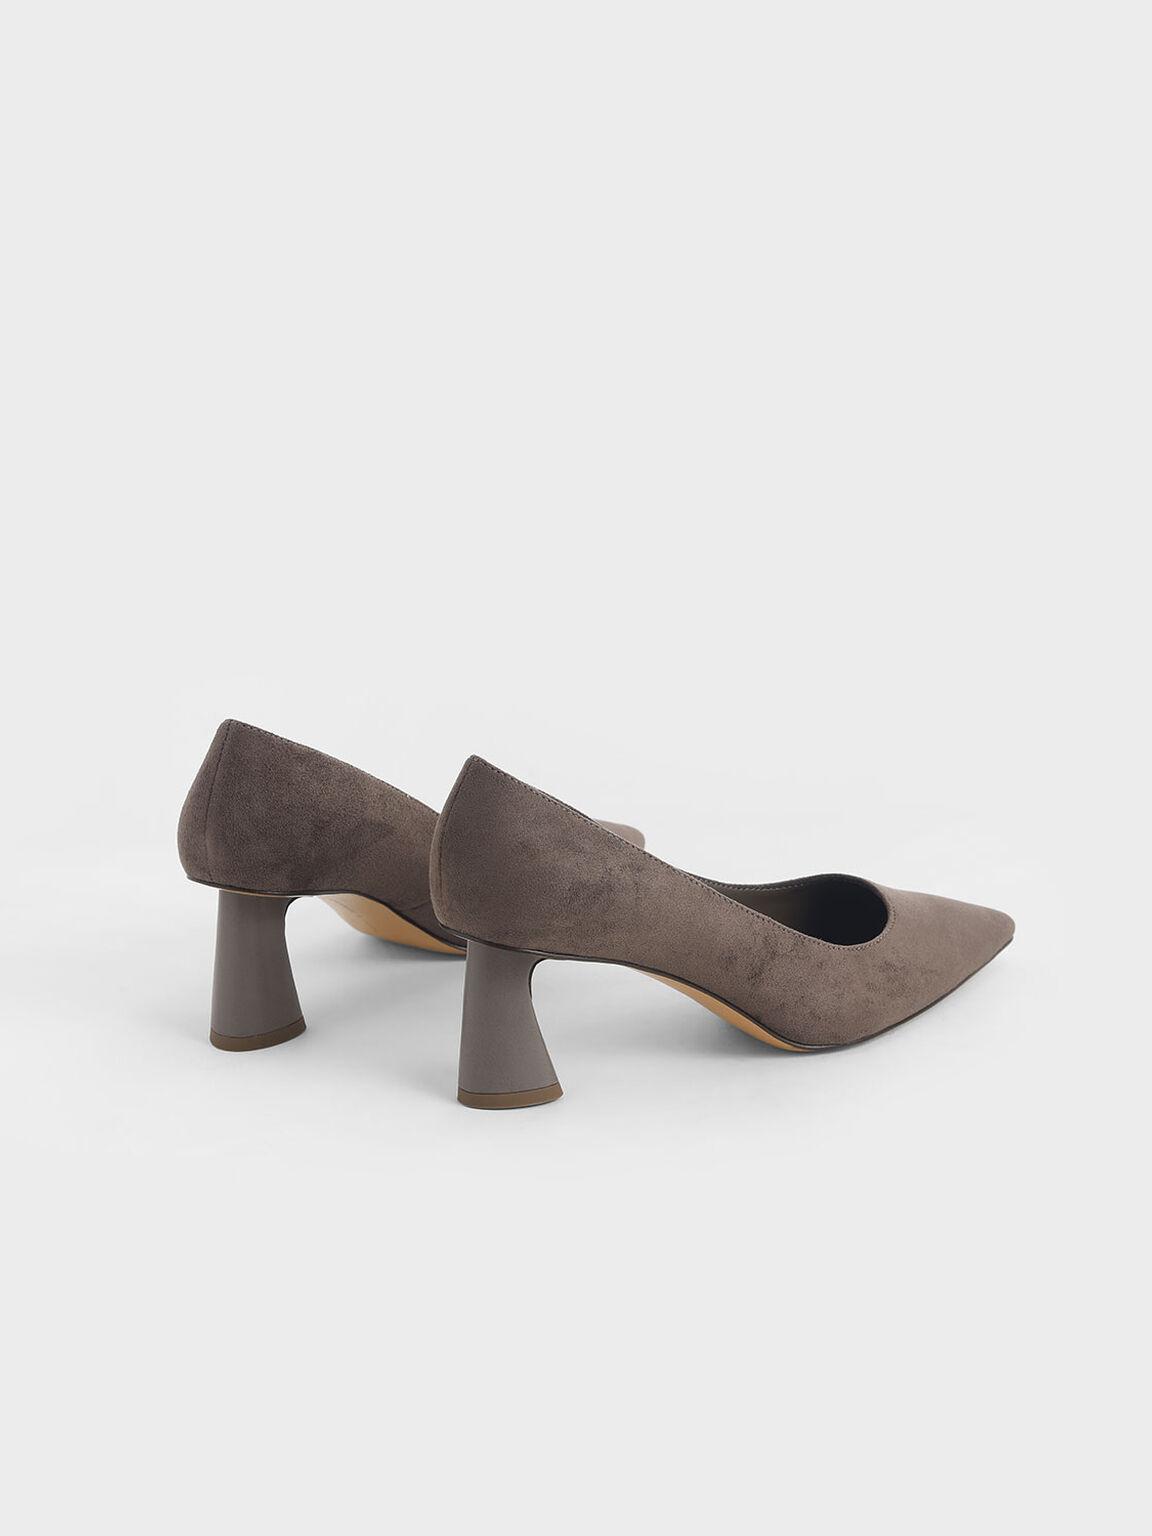 Textured Sculptural Heel Pumps, Taupe, hi-res